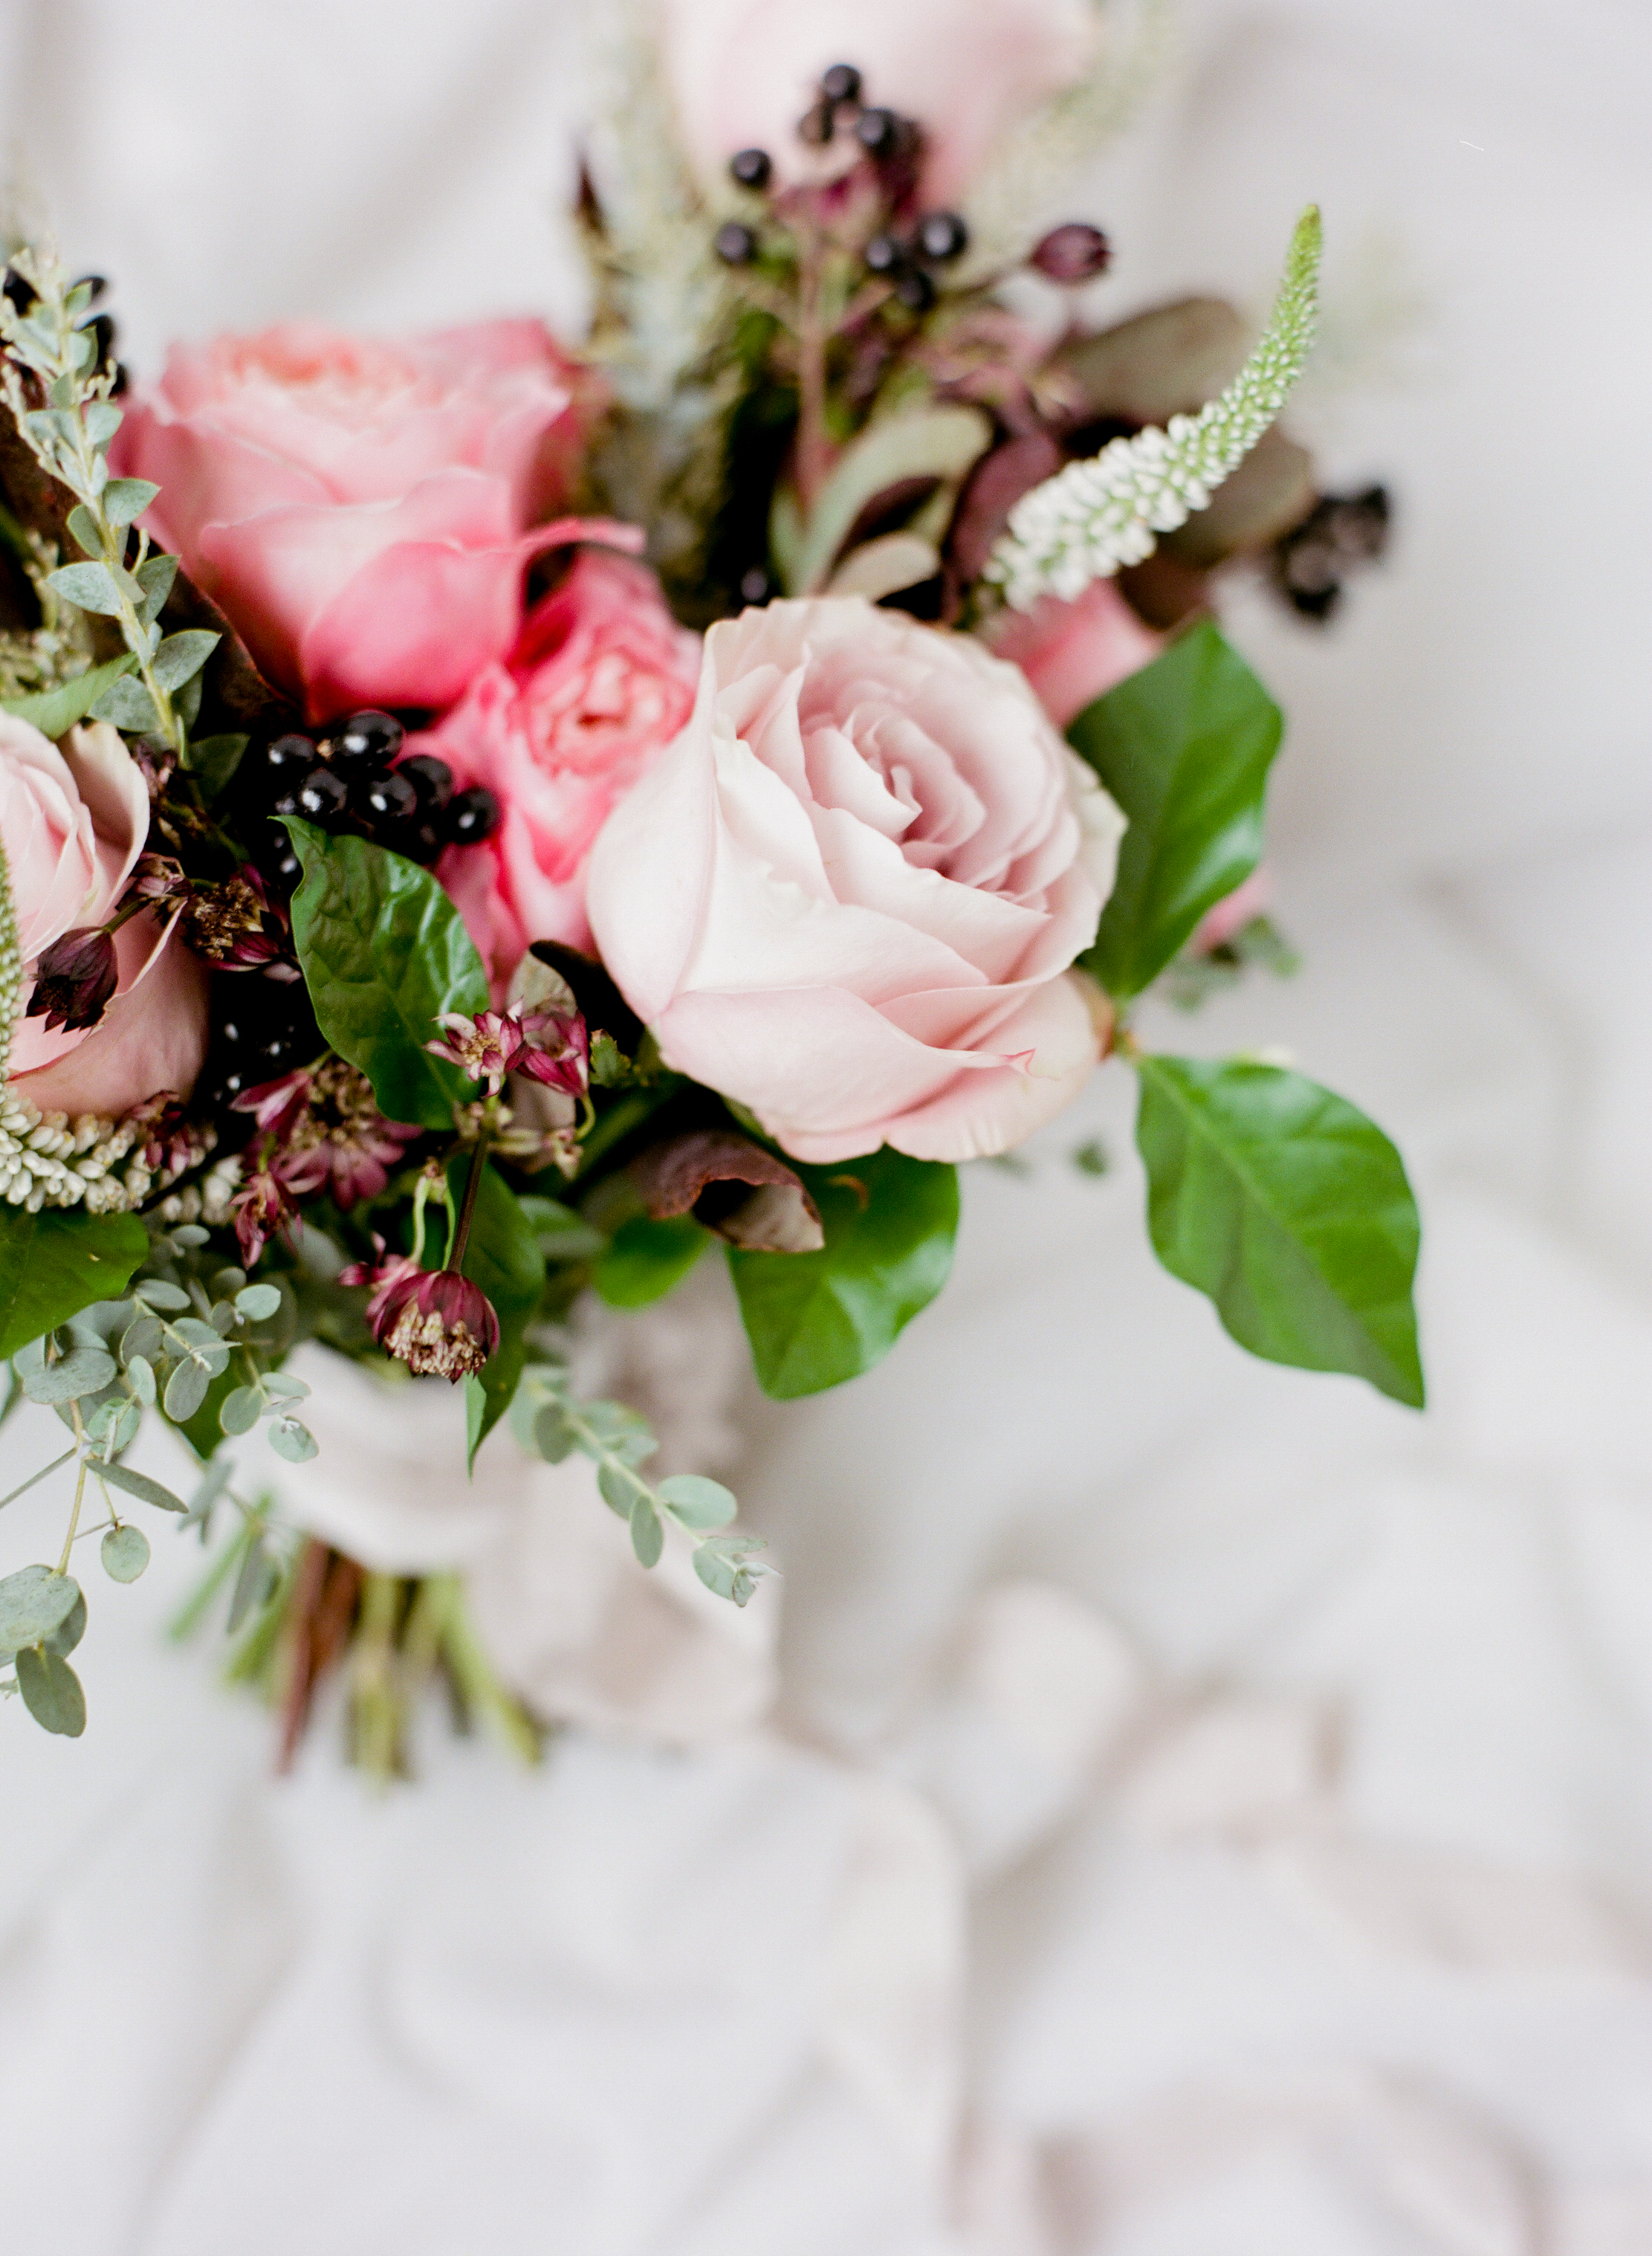 wedding flower ideas - wedding florist in winnipeg